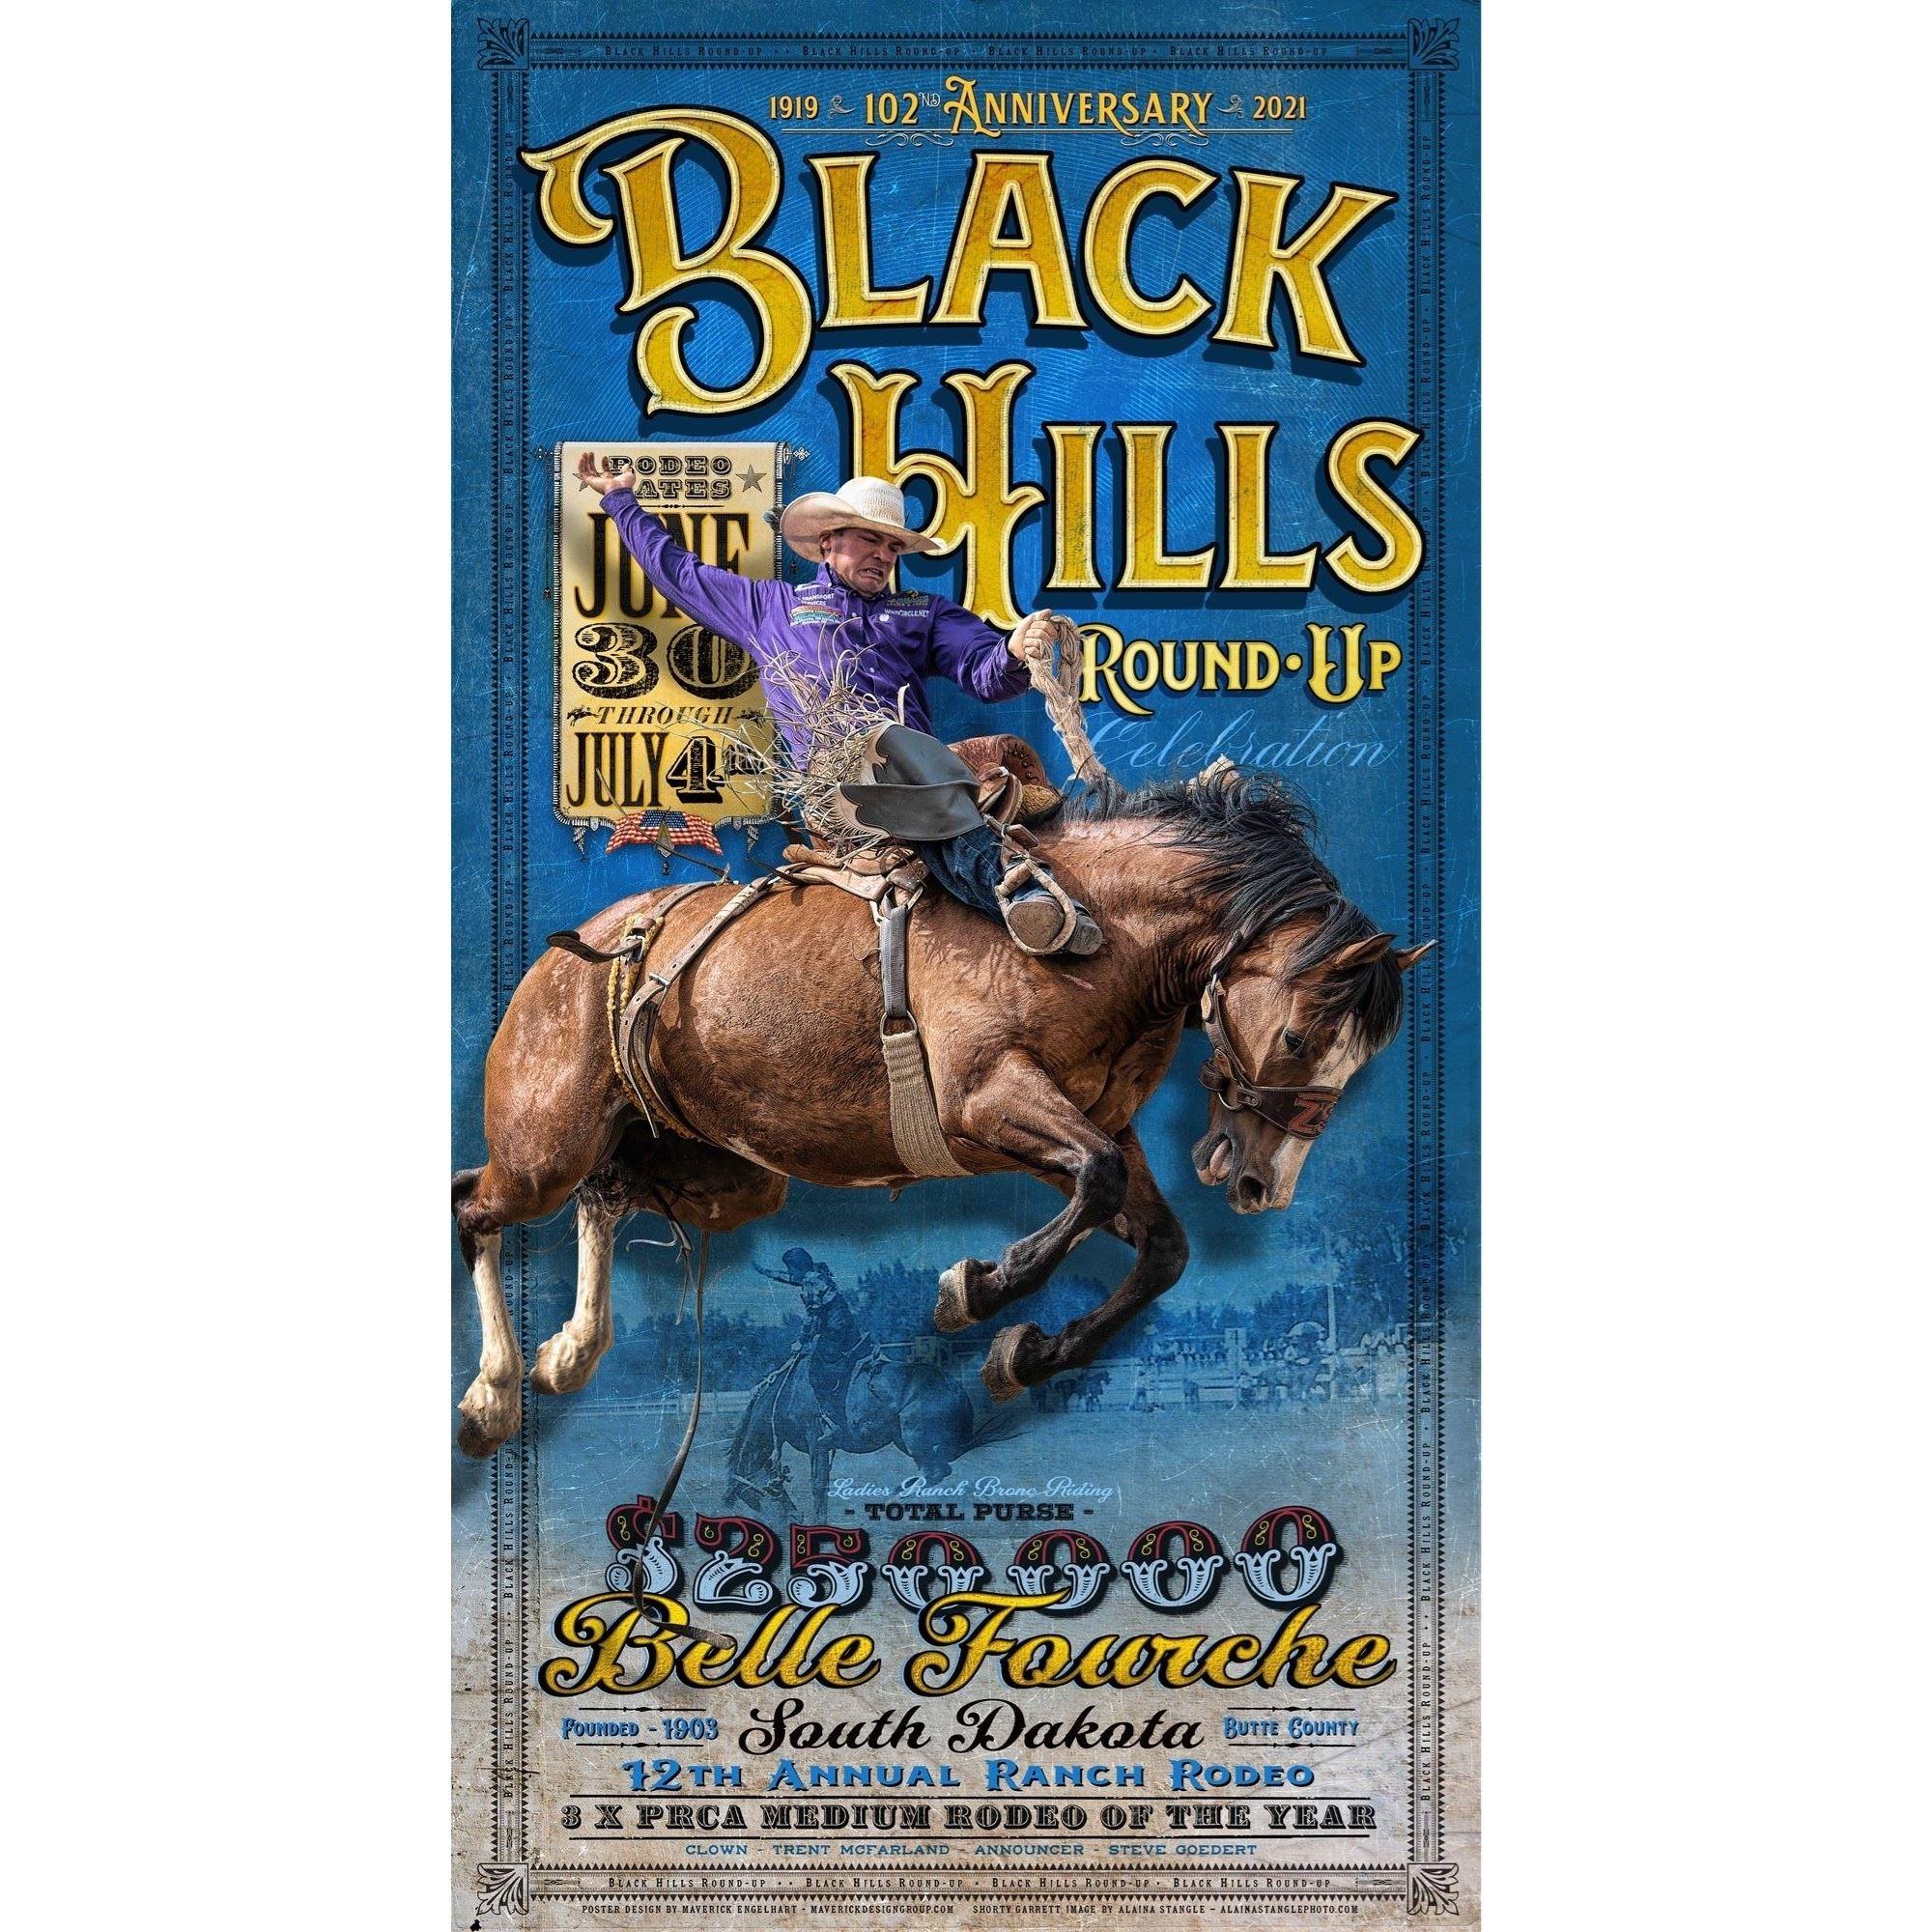 102nd Black Hills Roundup Commemorative Poster